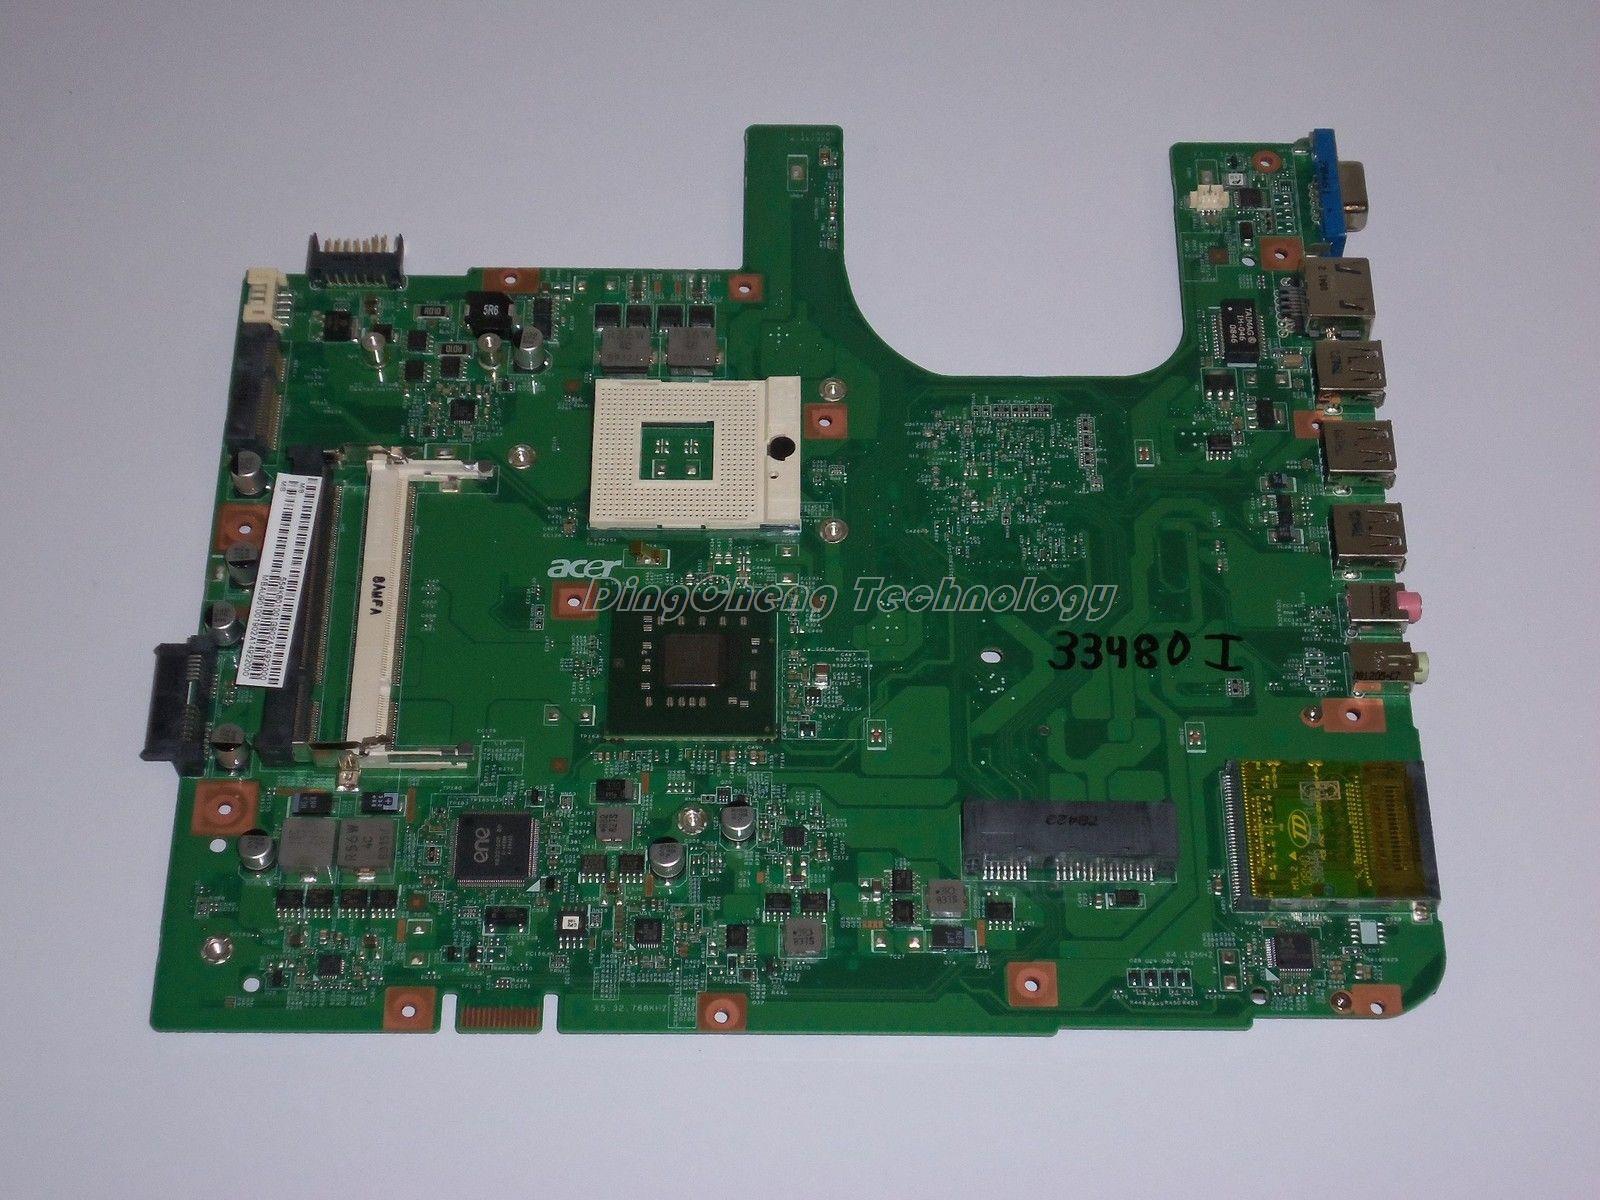 HOLYTIME Scheda Madre del computer portatile Per Acer 5735 5735z 08219-1 MBATR01001 48.4K801.011 MB. ATR01.001 GM45 DDR2 scheda grafica integrataHOLYTIME Scheda Madre del computer portatile Per Acer 5735 5735z 08219-1 MBATR01001 48.4K801.011 MB. ATR01.001 GM45 DDR2 scheda grafica integrata